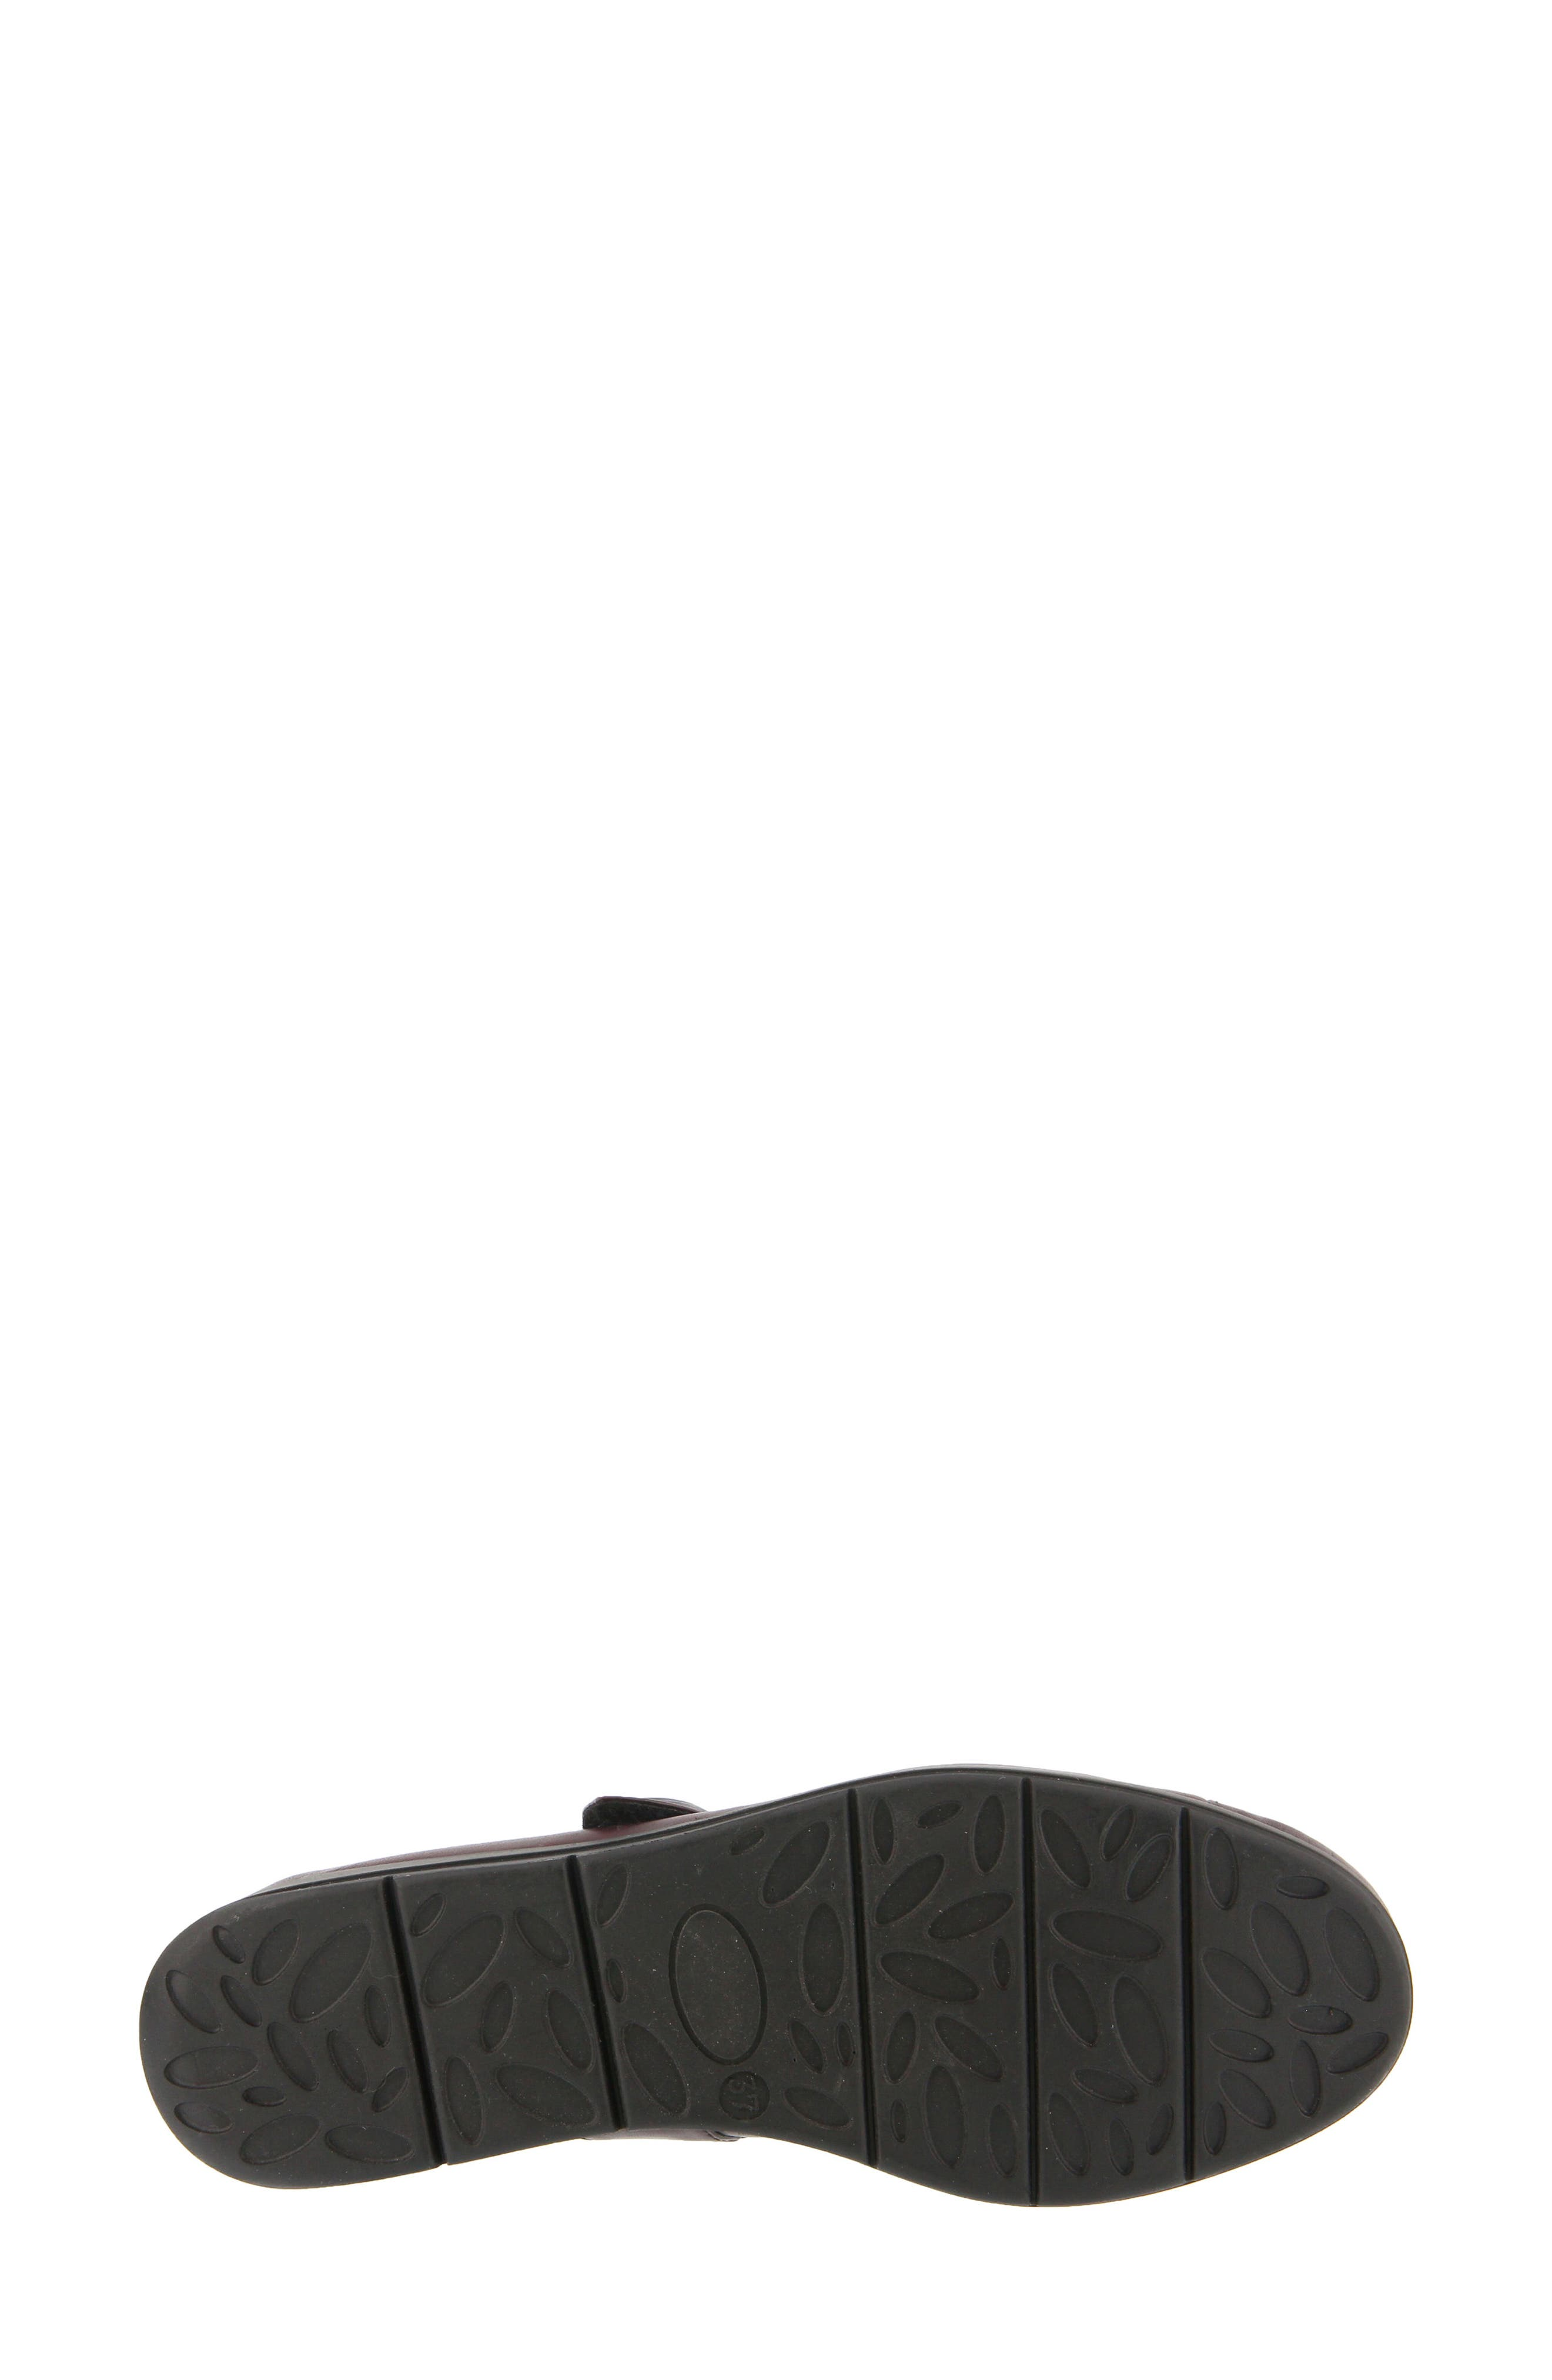 Zemira Flat,                             Alternate thumbnail 4, color,                             Bordeaux Leather